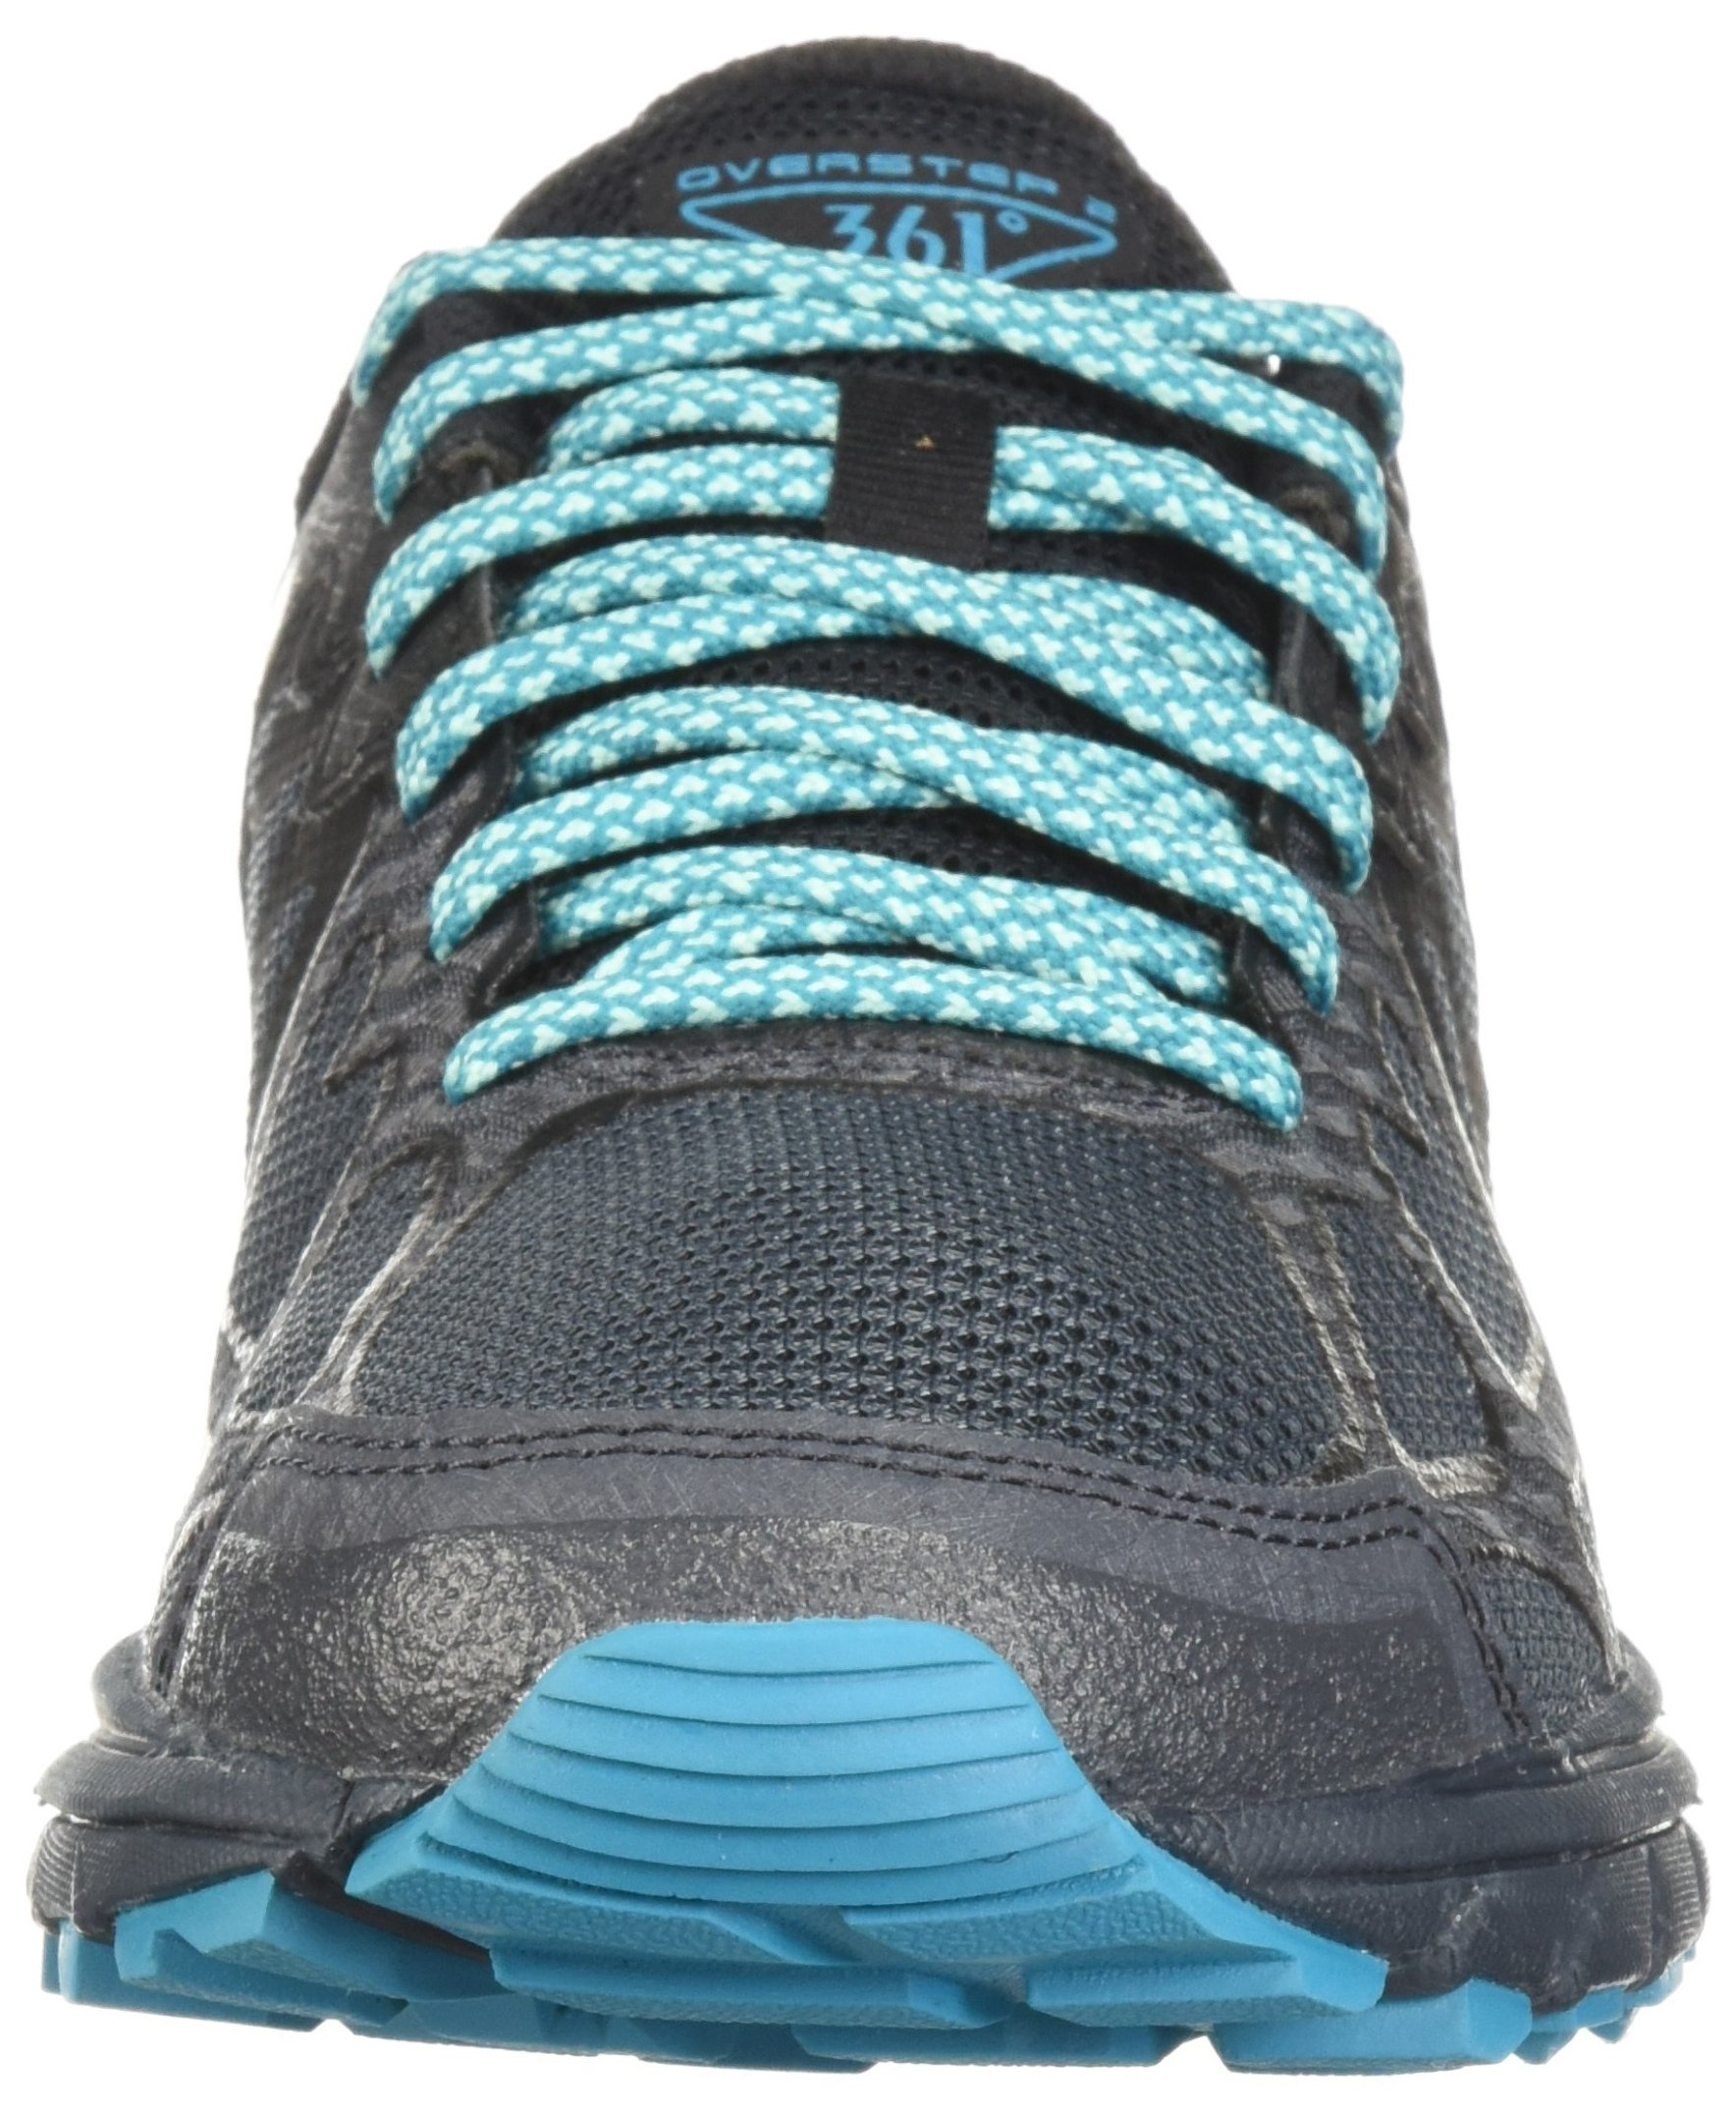 d2f90253bc059 ایگرد - خرید از آمازون   361 Women's 361-overstep 2 Trail Running Shoe